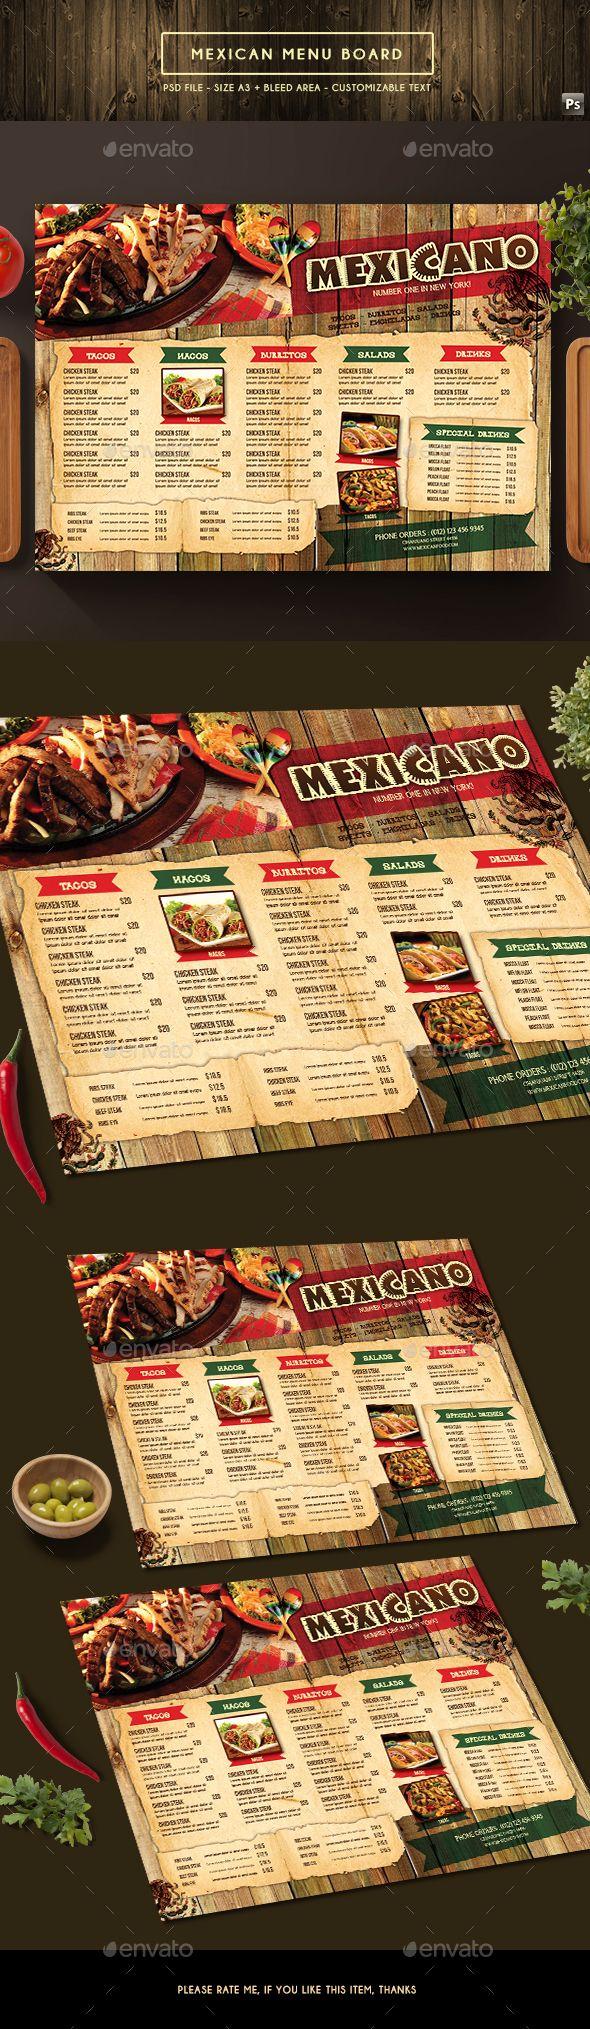 Mexican Menu Board - Food Menus Print Templates Download here : https://graphicriver.net/item/mexican-menu-board/19538493?s_rank=64&ref=Al-fatih